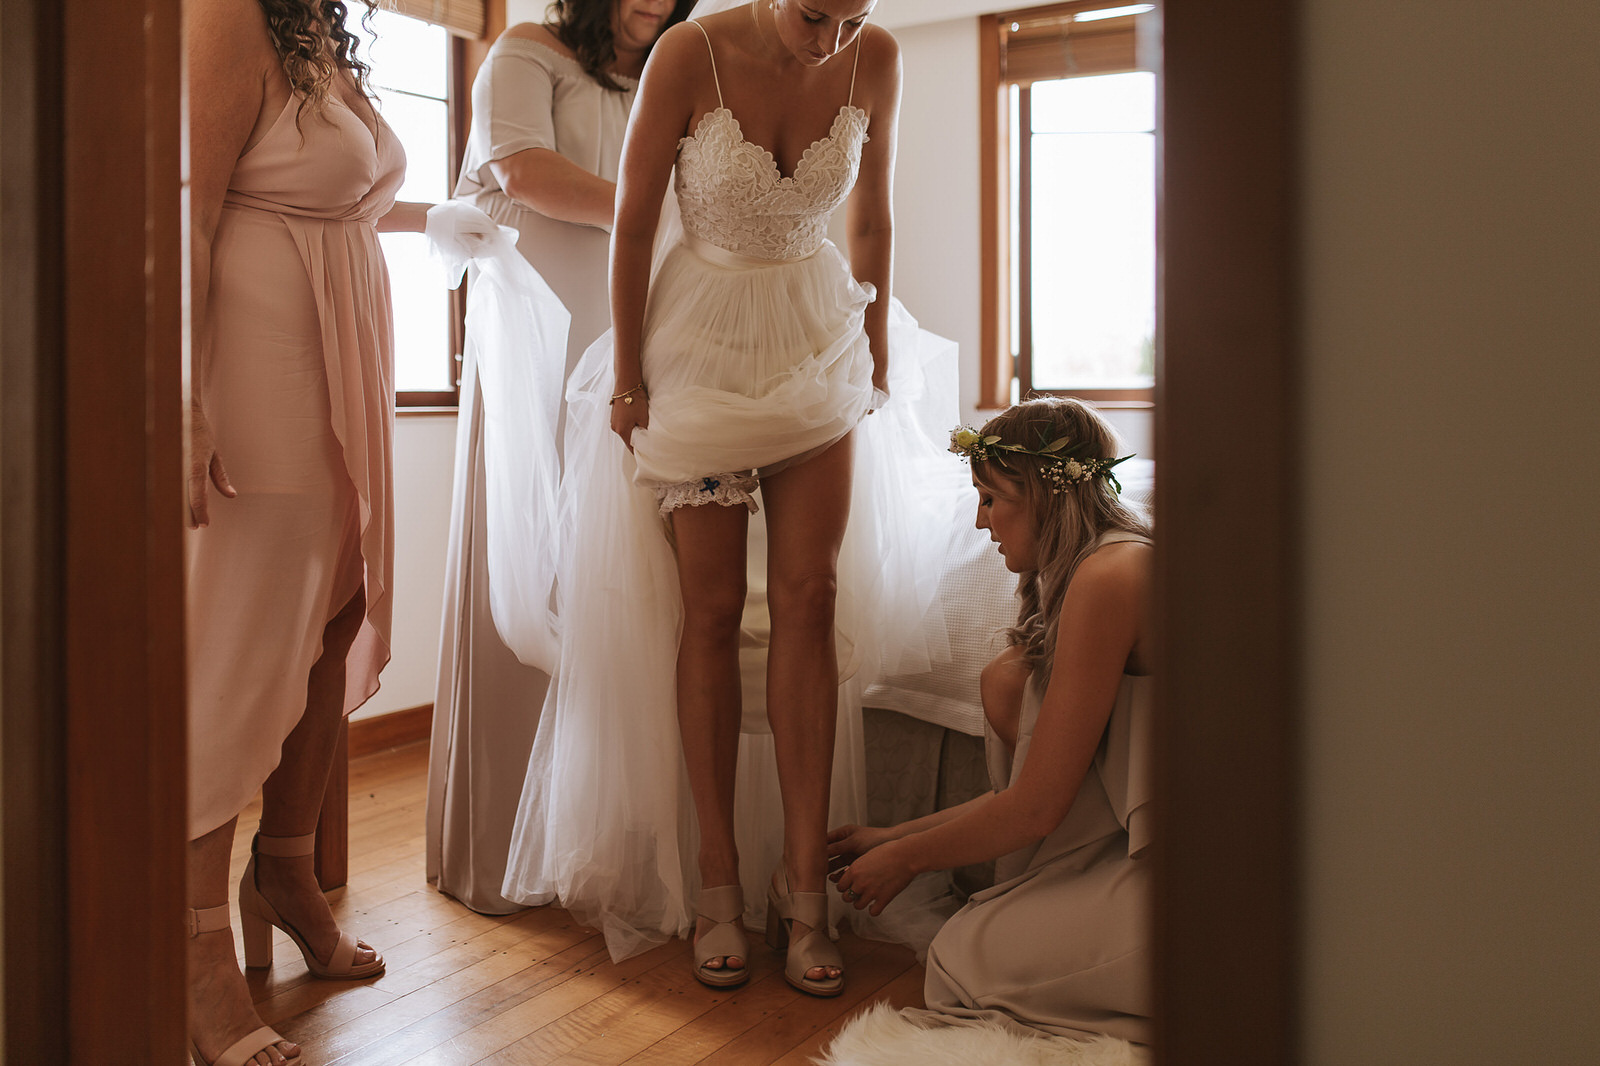 newfound-r-s-ataahua-garden-venue-tauranga-wedding-015